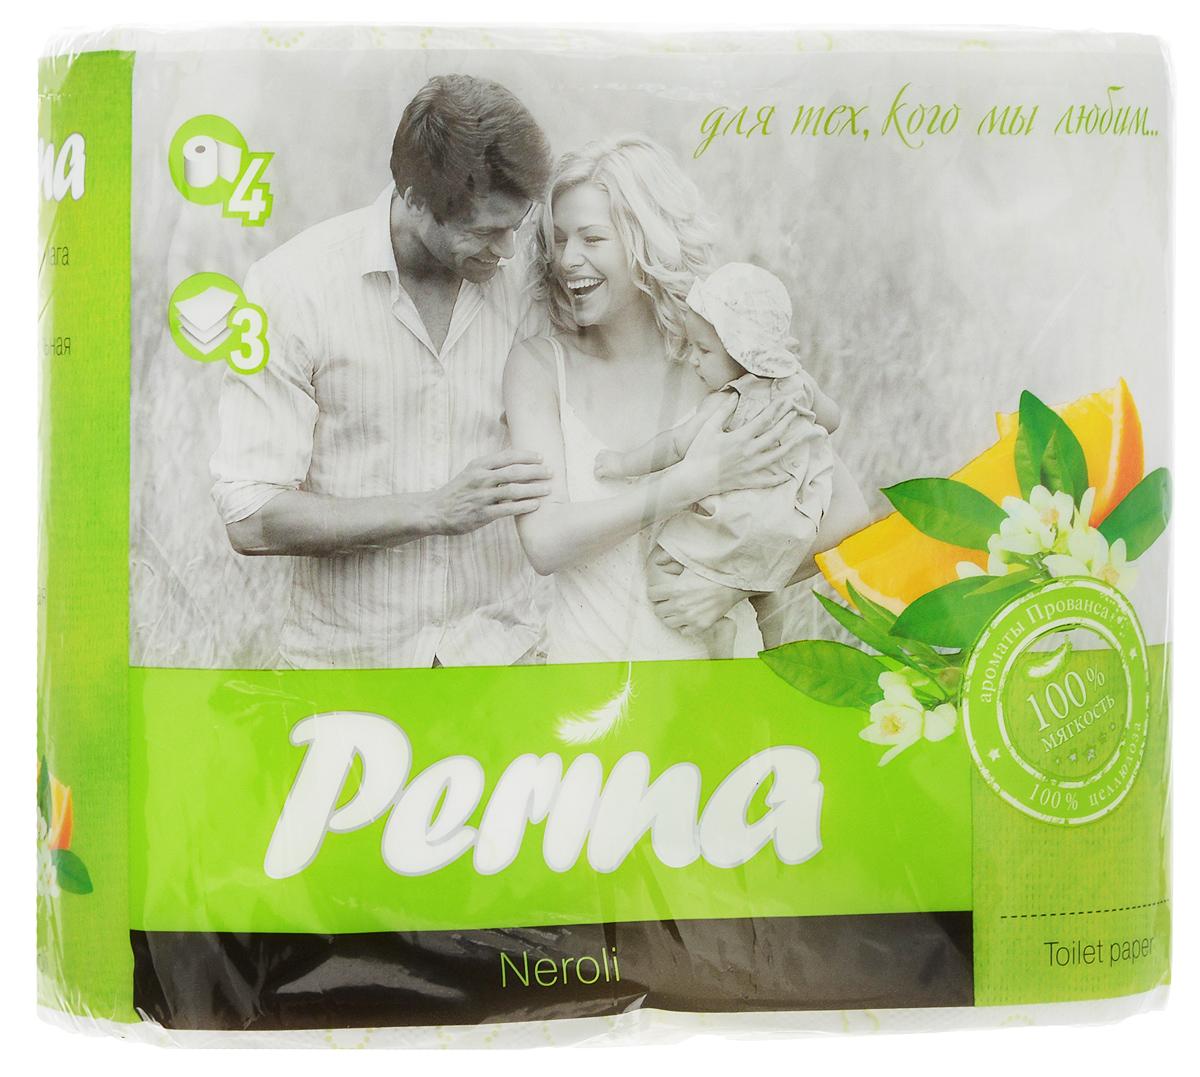 Бумага туалетная Perina Neroli, ароматизированная, трехслойная, 4 рулона туалетная бумага анекдоты ч 8 мини 815605